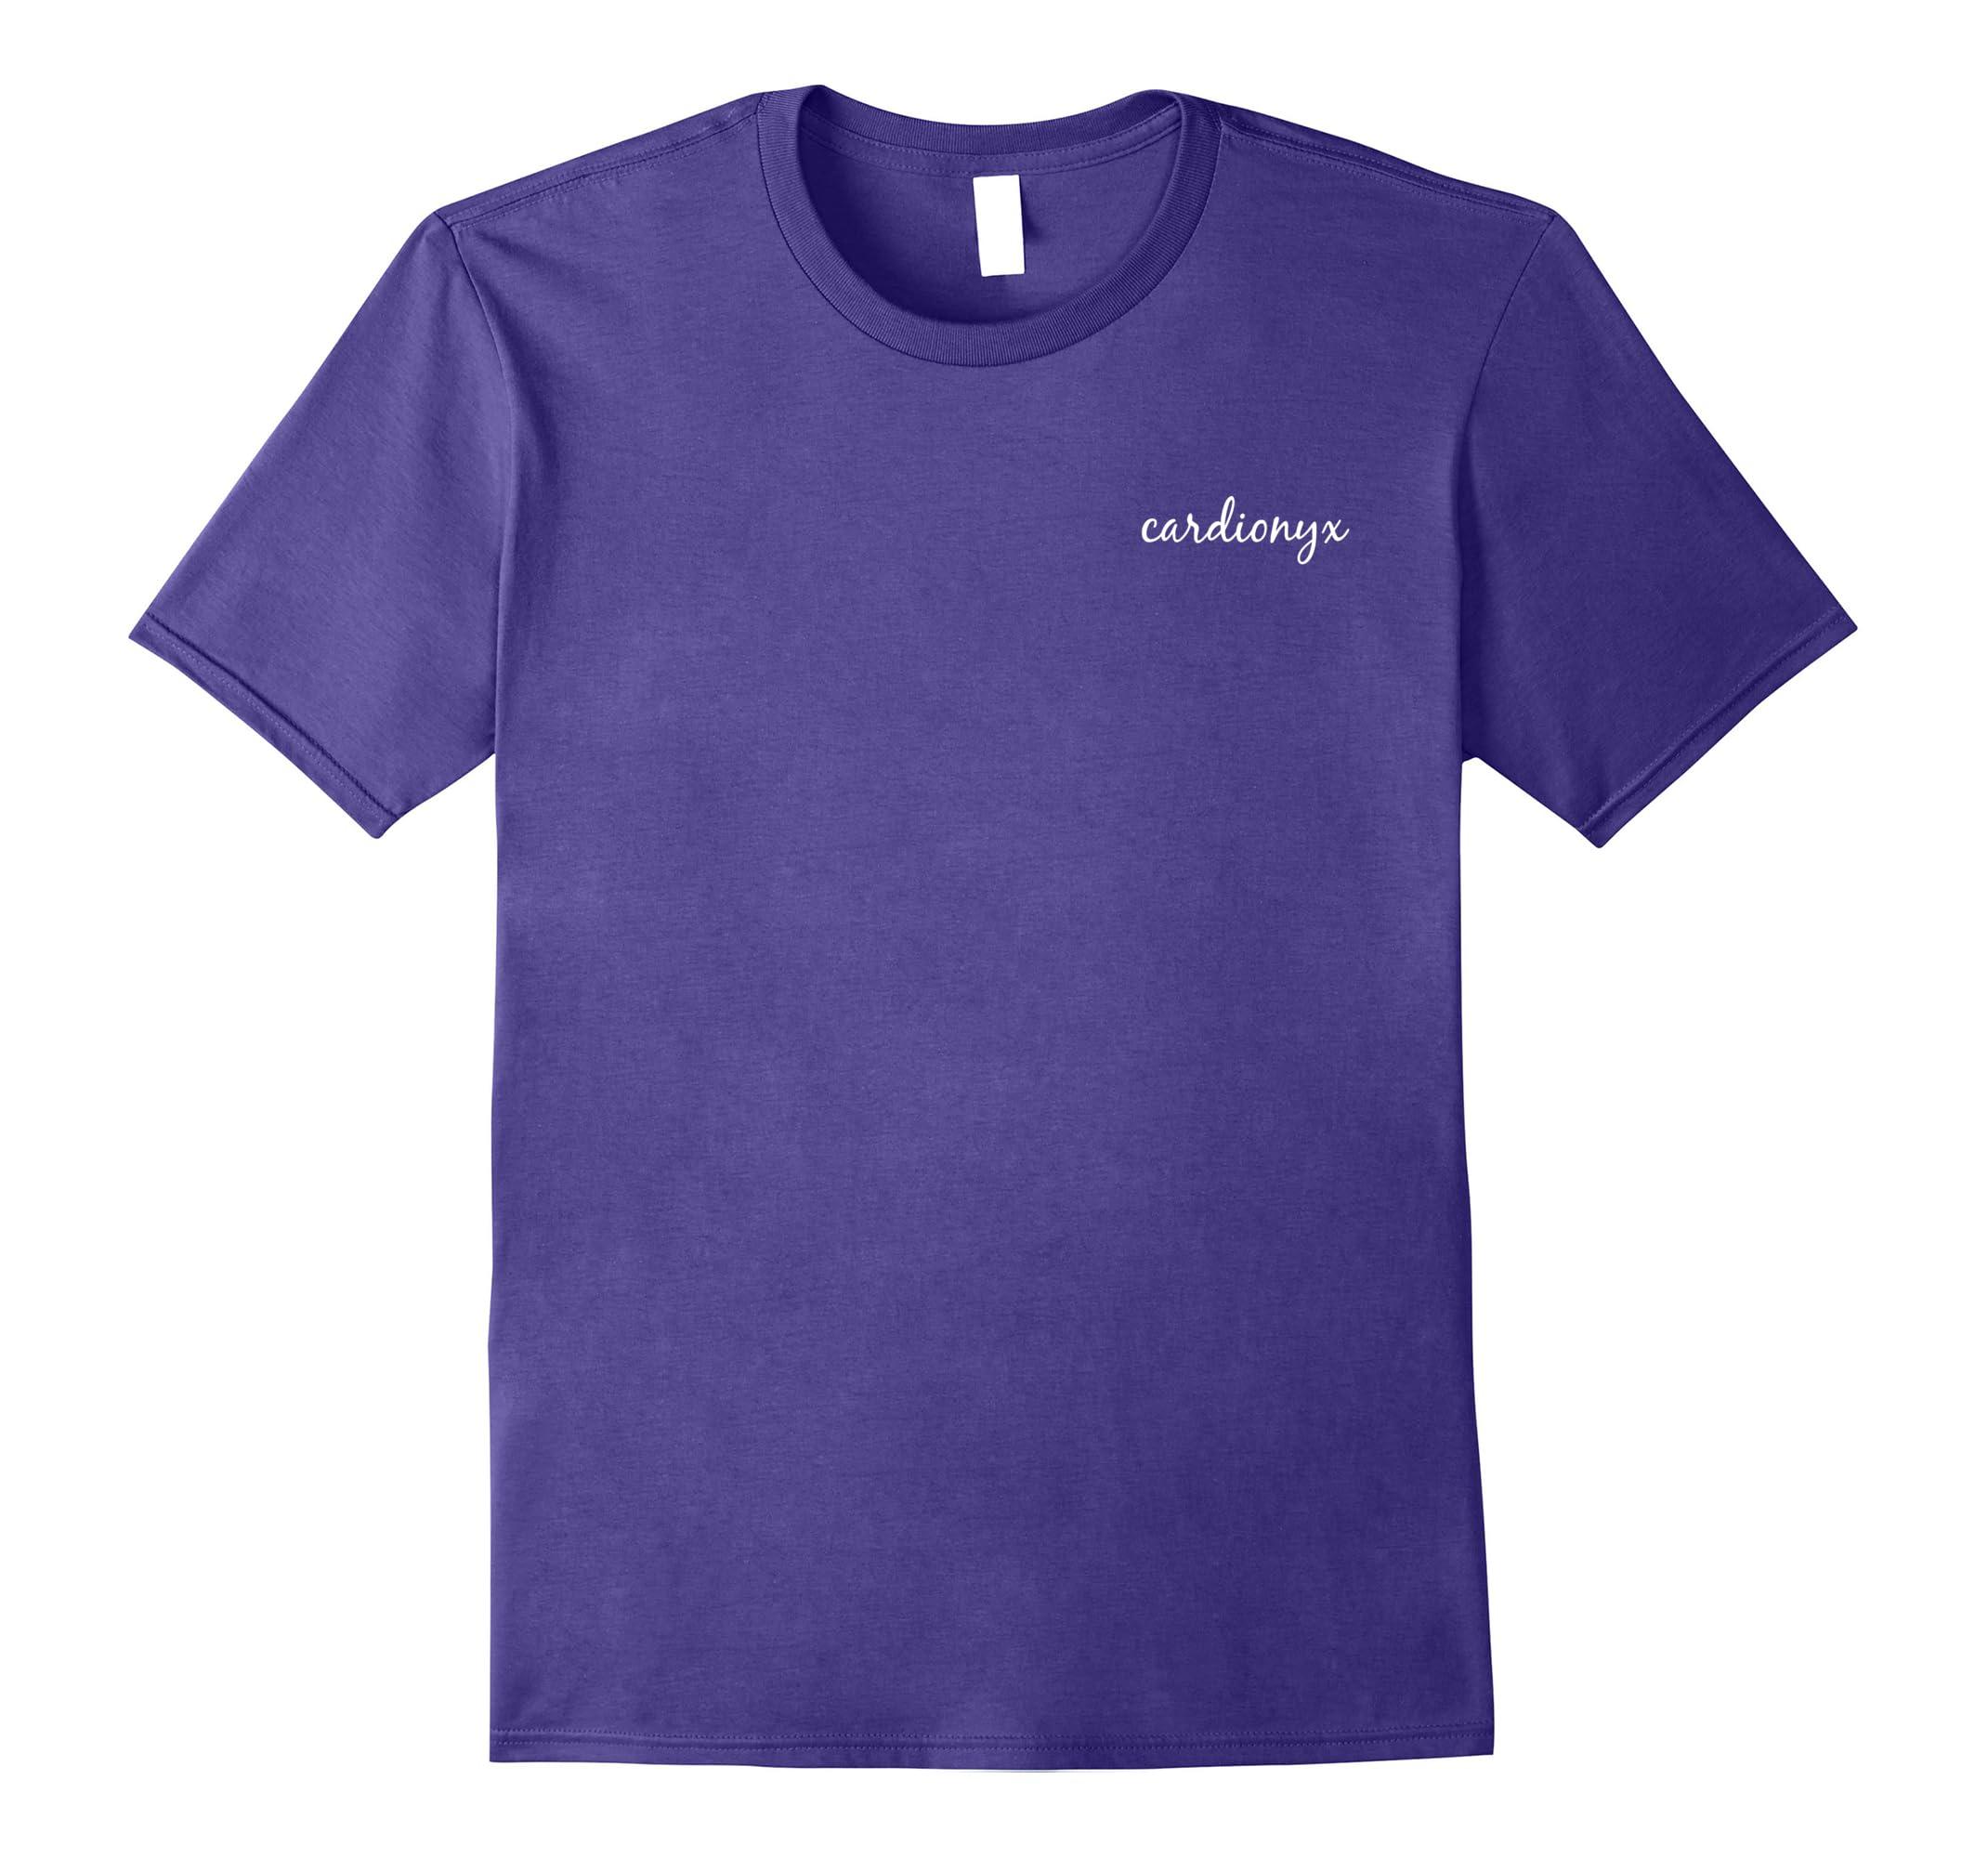 Cardionyx Fitness Workout Activewear Script T-Shirt-RT